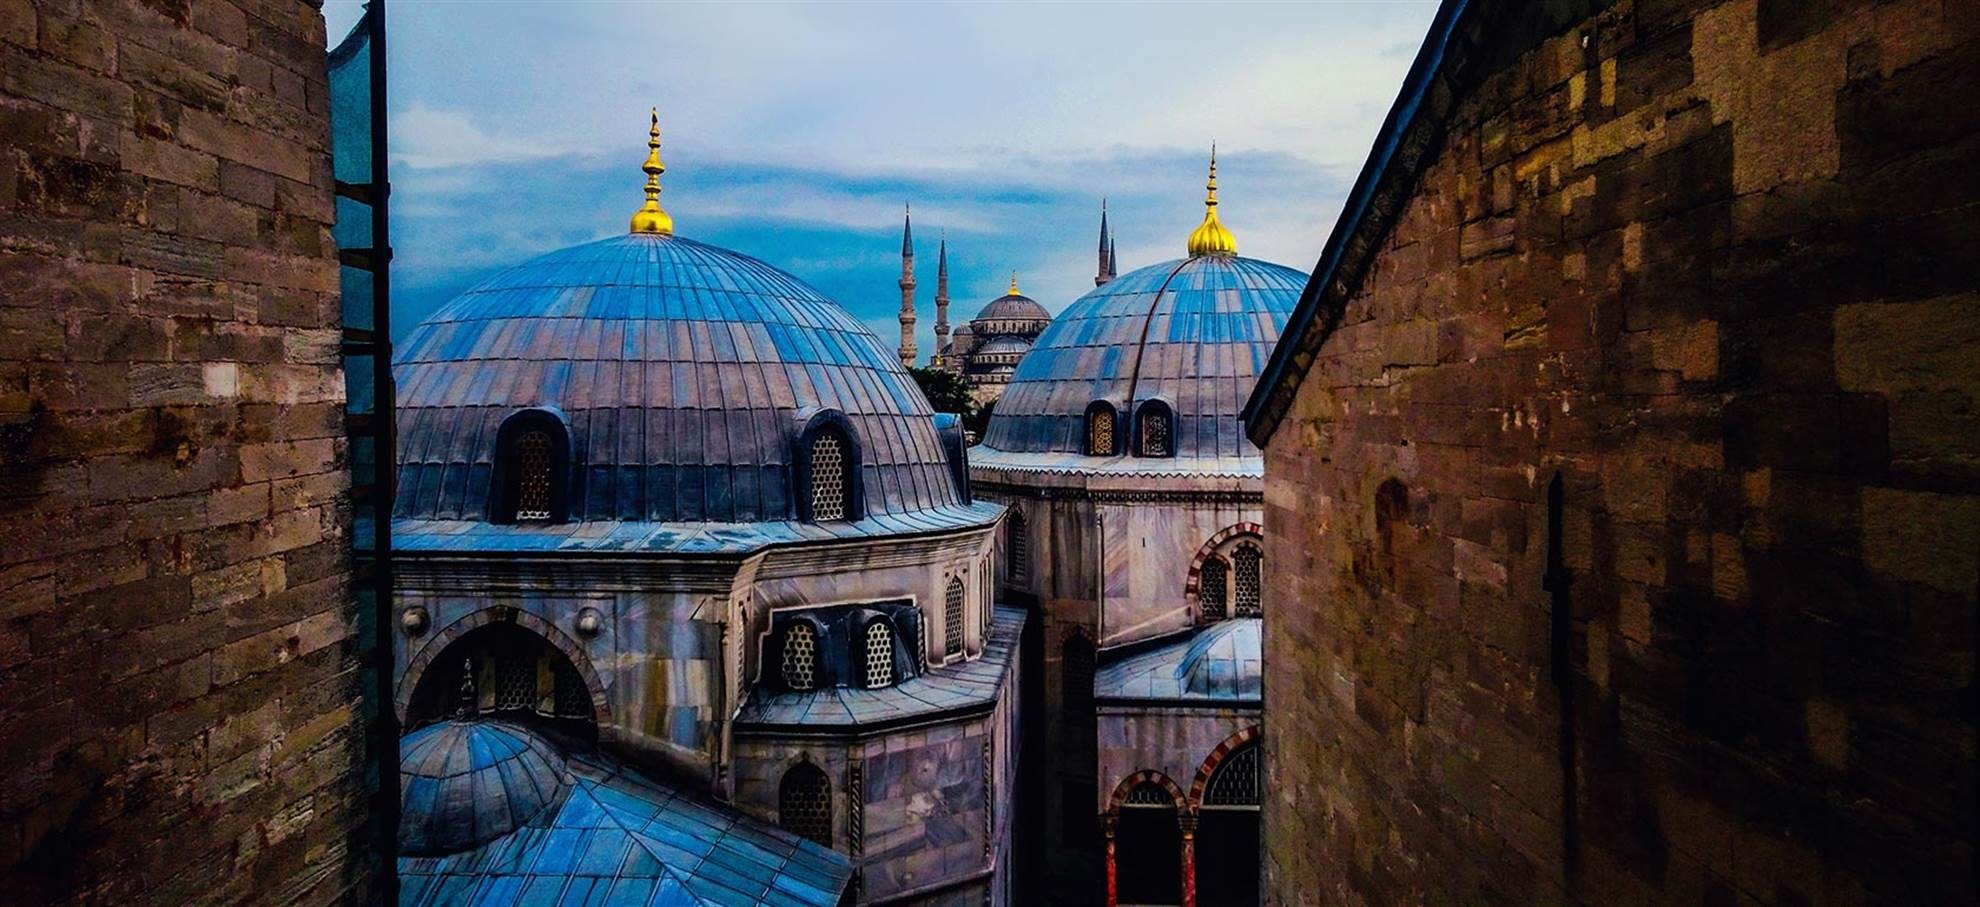 Hagia Sophia & Blue Mosque Tour (Skip the line)